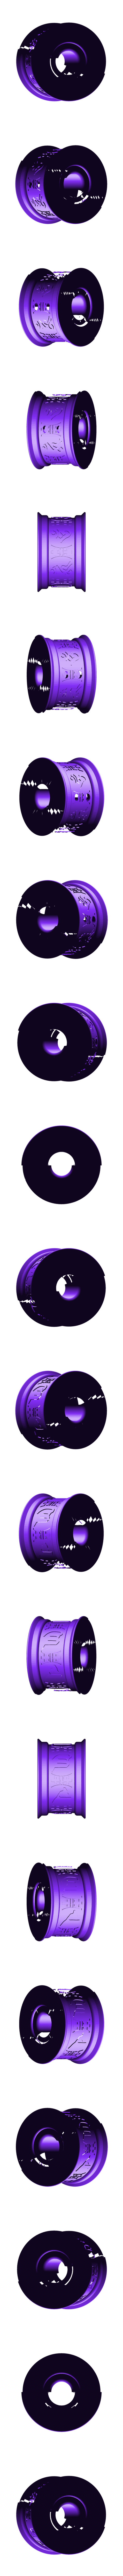 Body.stl Download free STL file Hand Prayer Wheel (Diameter 5cm) • 3D printable design, NickChung